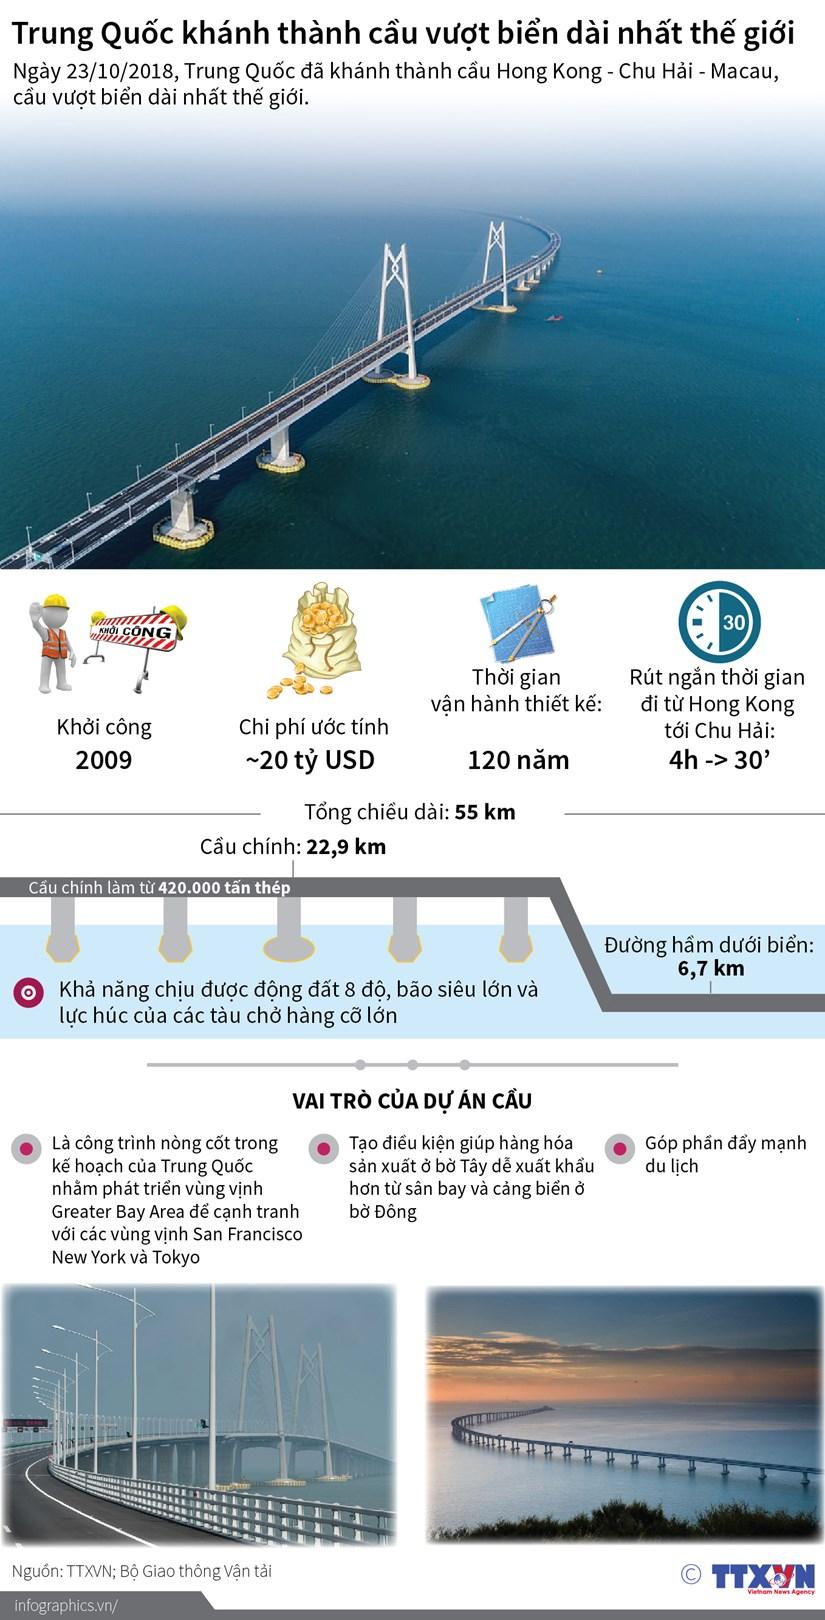 [Infographics] Trung Quoc khanh thanh cau vuot bien dai nhat the gioi hinh anh 1